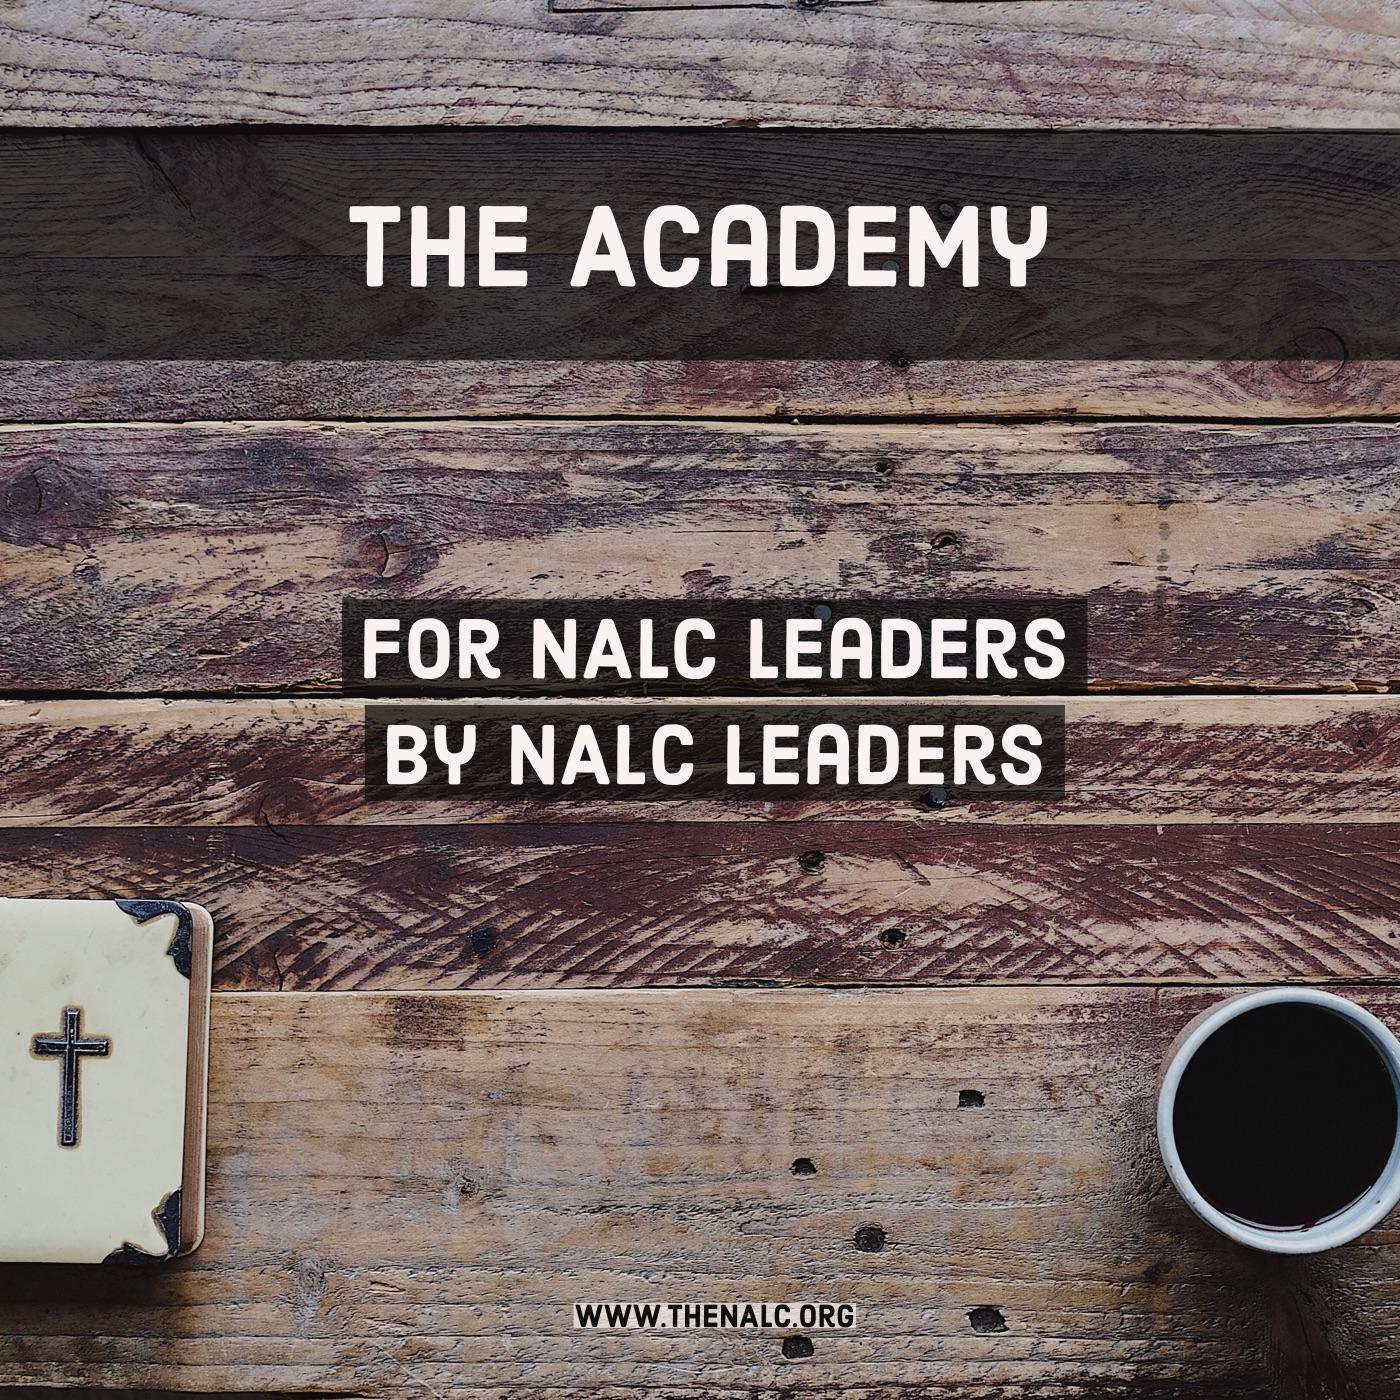 The Academy – The Apostles' Teaching